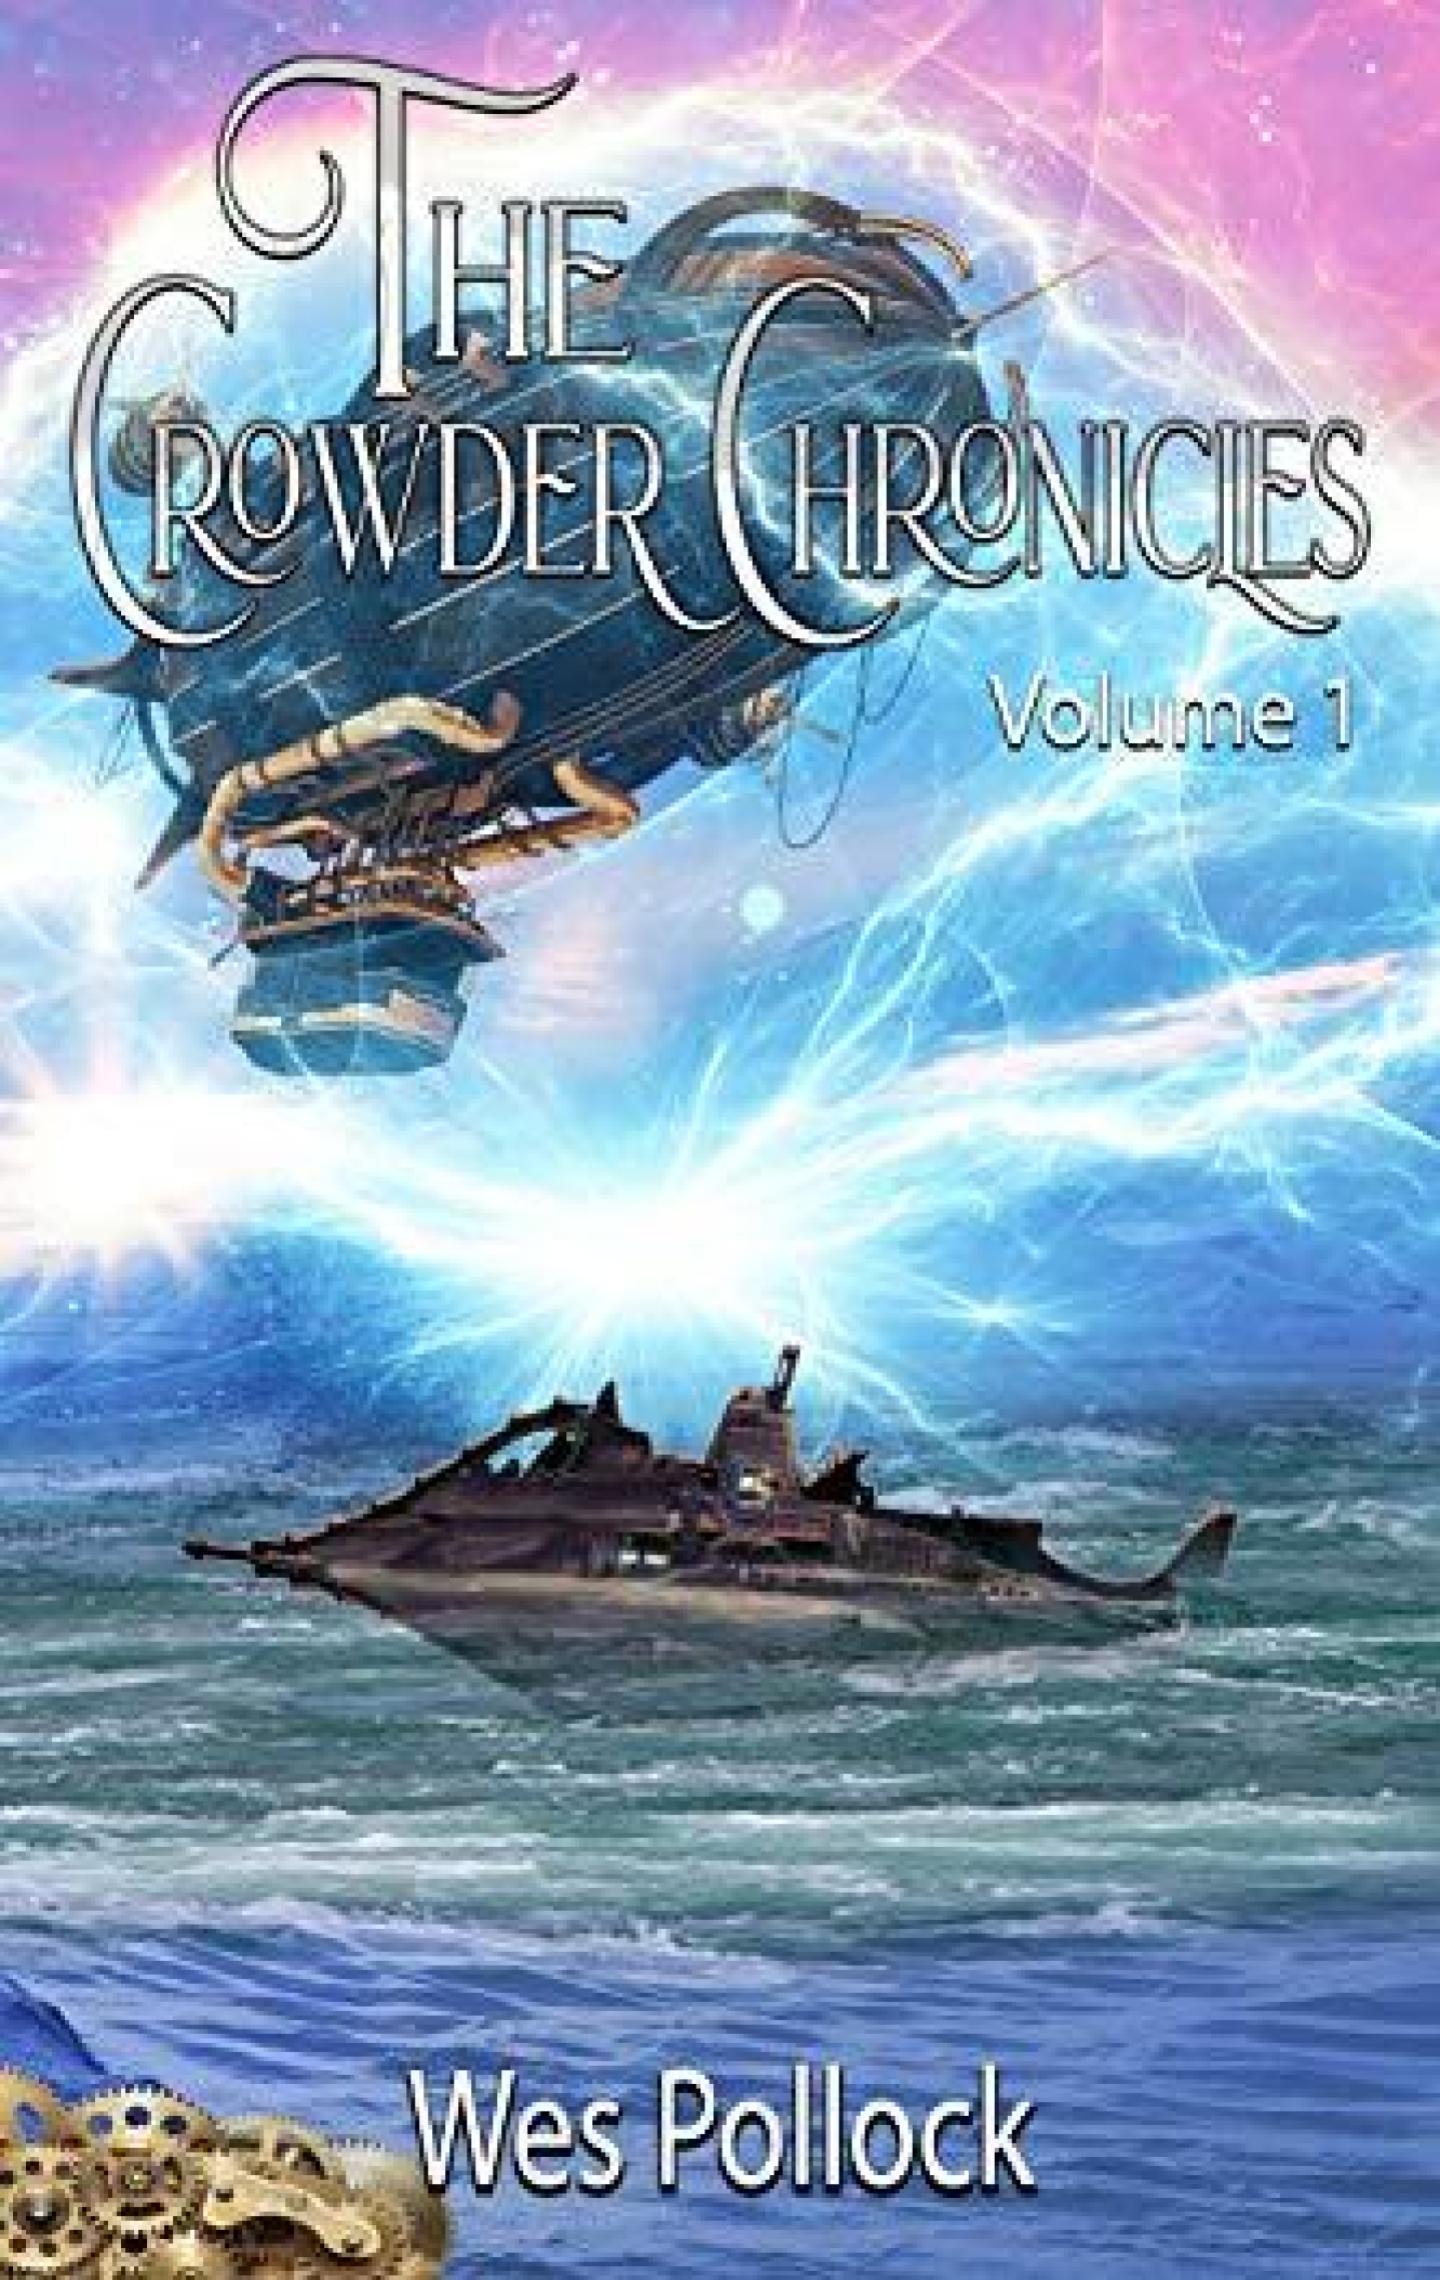 The Crowder Chronicles, Vol.1